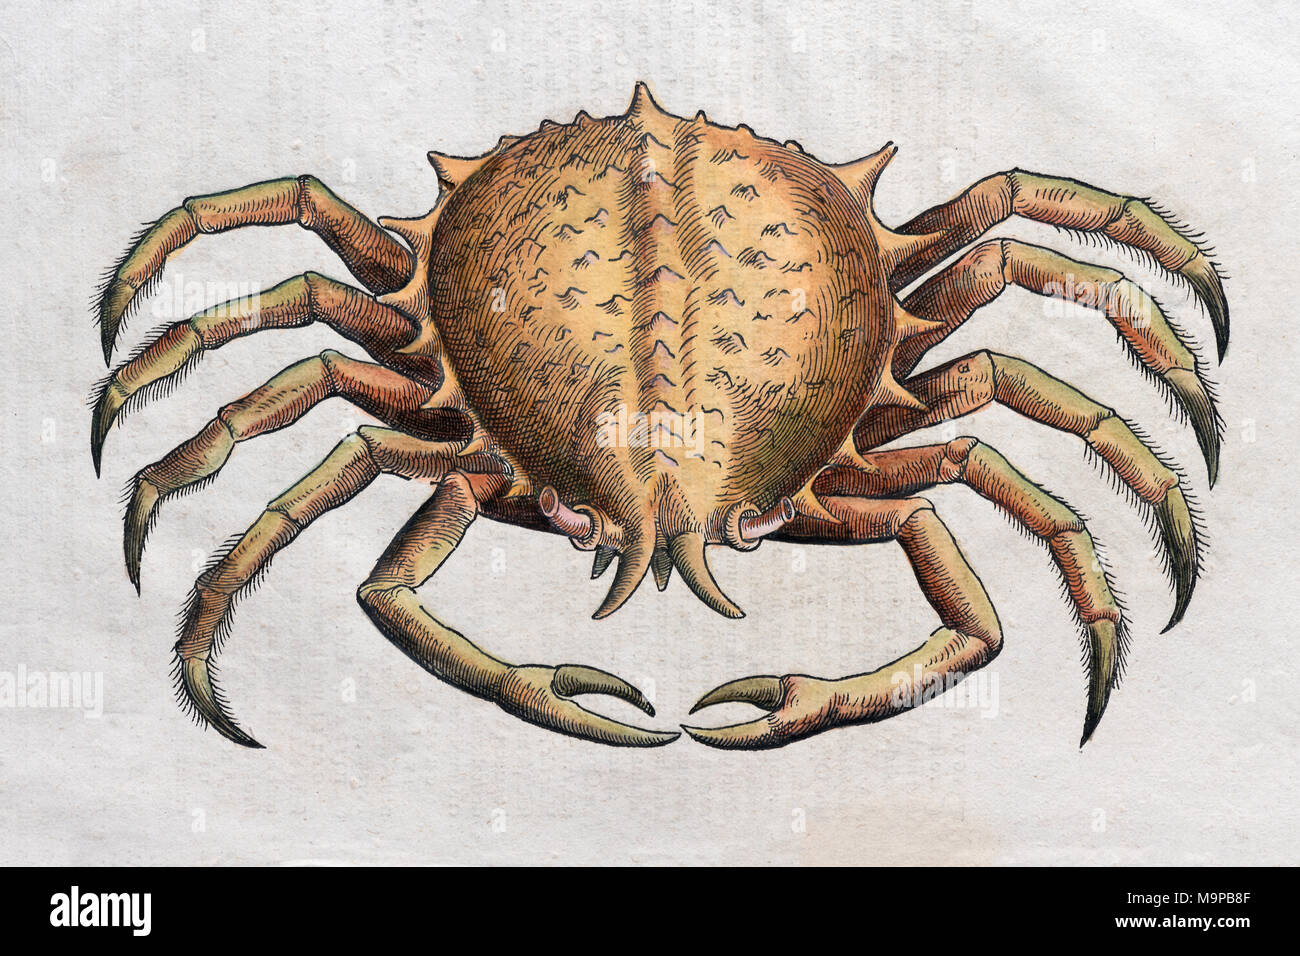 Crab (Brachyura), hand-coloured woodcut by Pietro Andrea Mattioli, 1570 - Stock Image